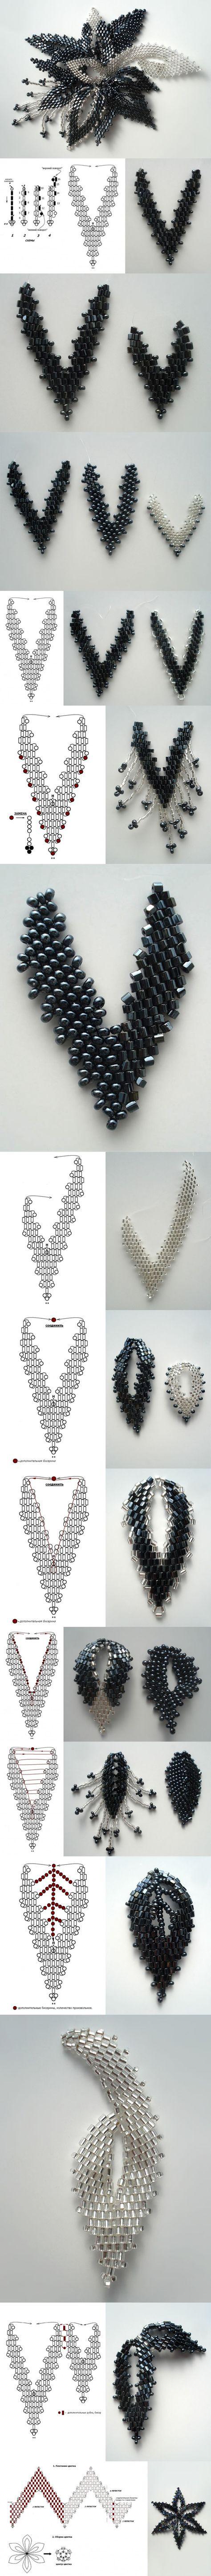 DIY Cool Bead Flower Pendant | www.FabArtDIY.com LIKE Us on Facebook ==> https://www.facebook.com/FabArtDIY